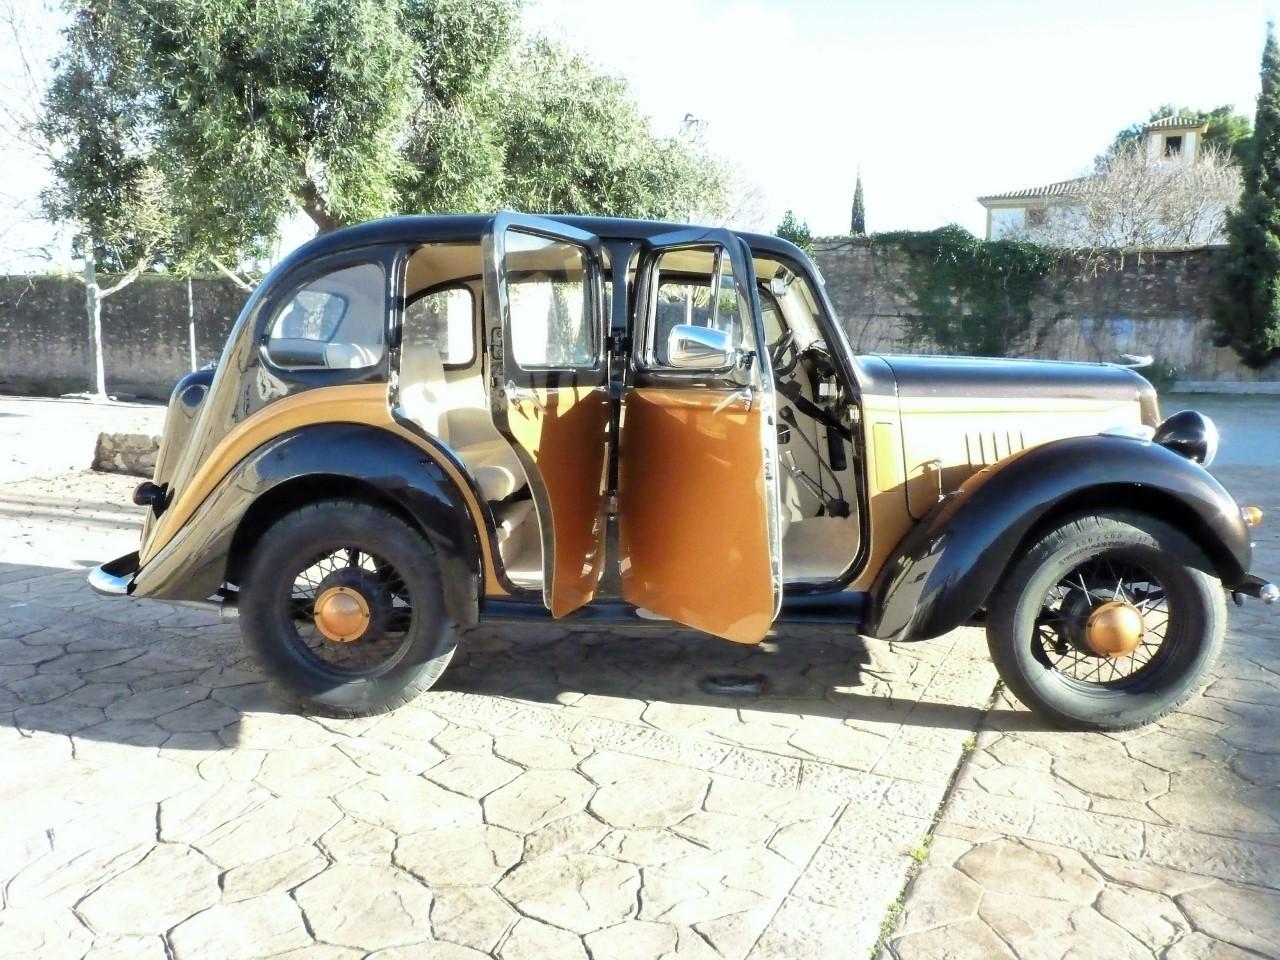 Oldtimer-Mallorca-Oldtimer-mieten-Mallorca-Hillman-Minx-1940-2